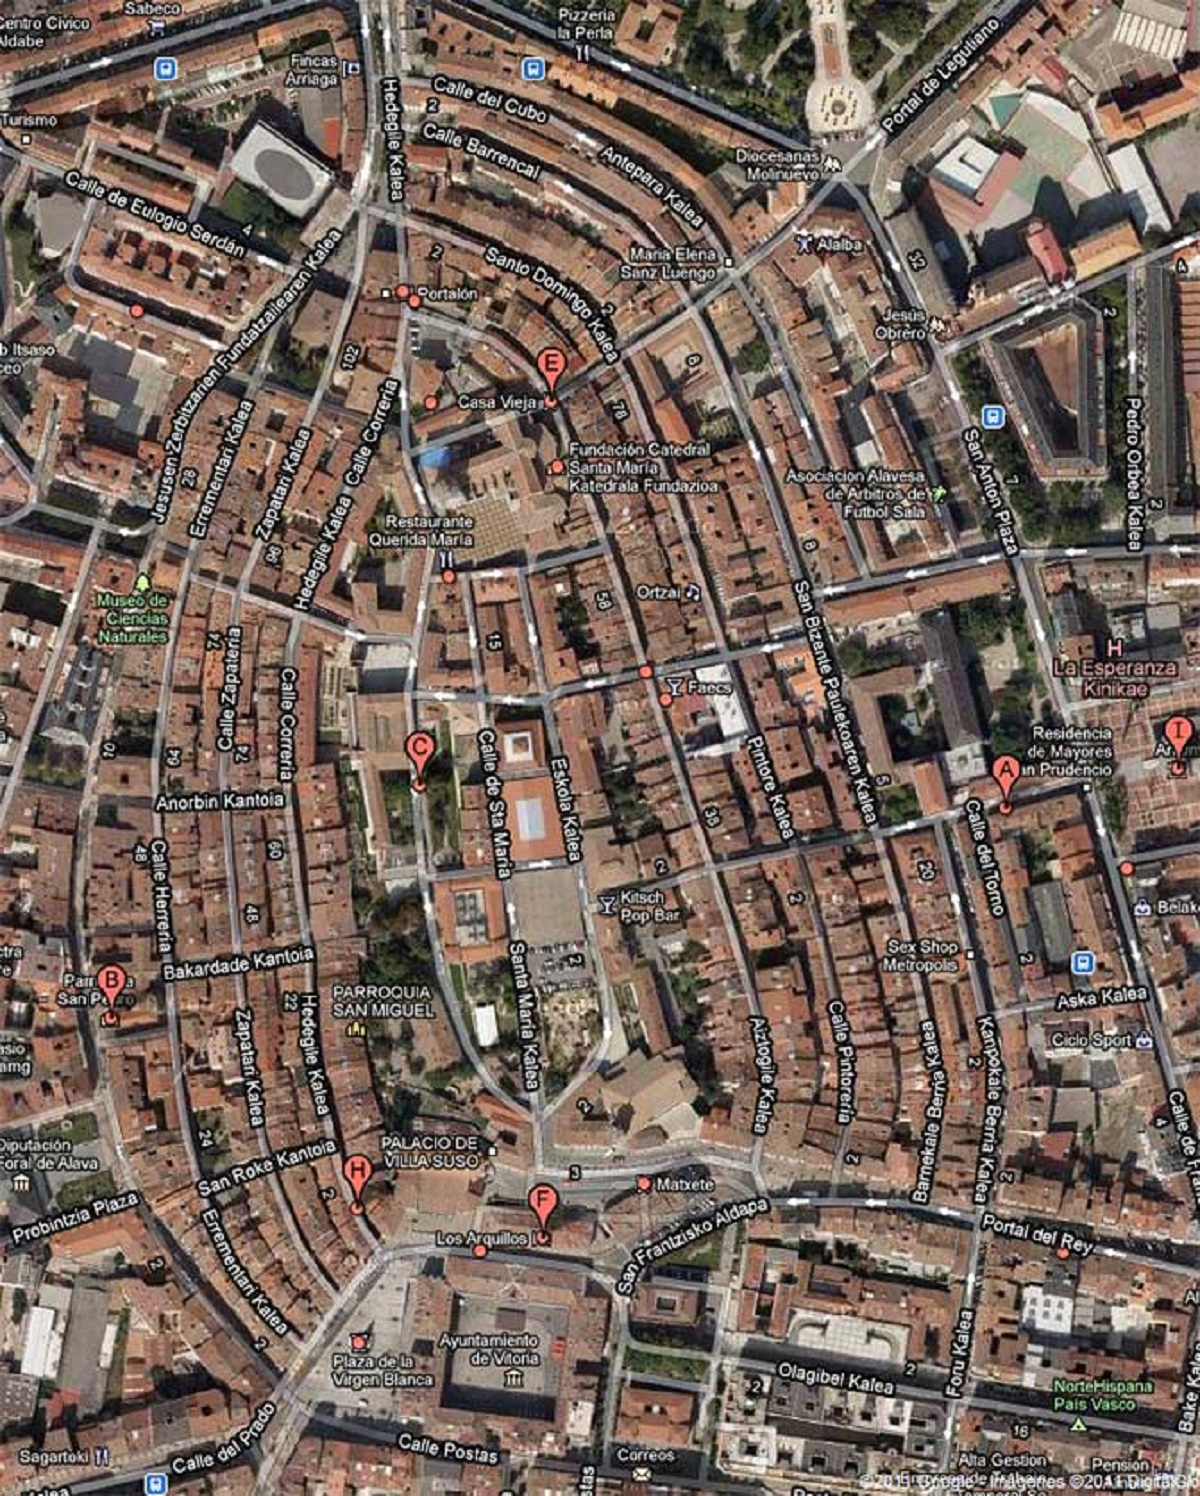 La almedra medieval de Vitoria-Gasteiz.